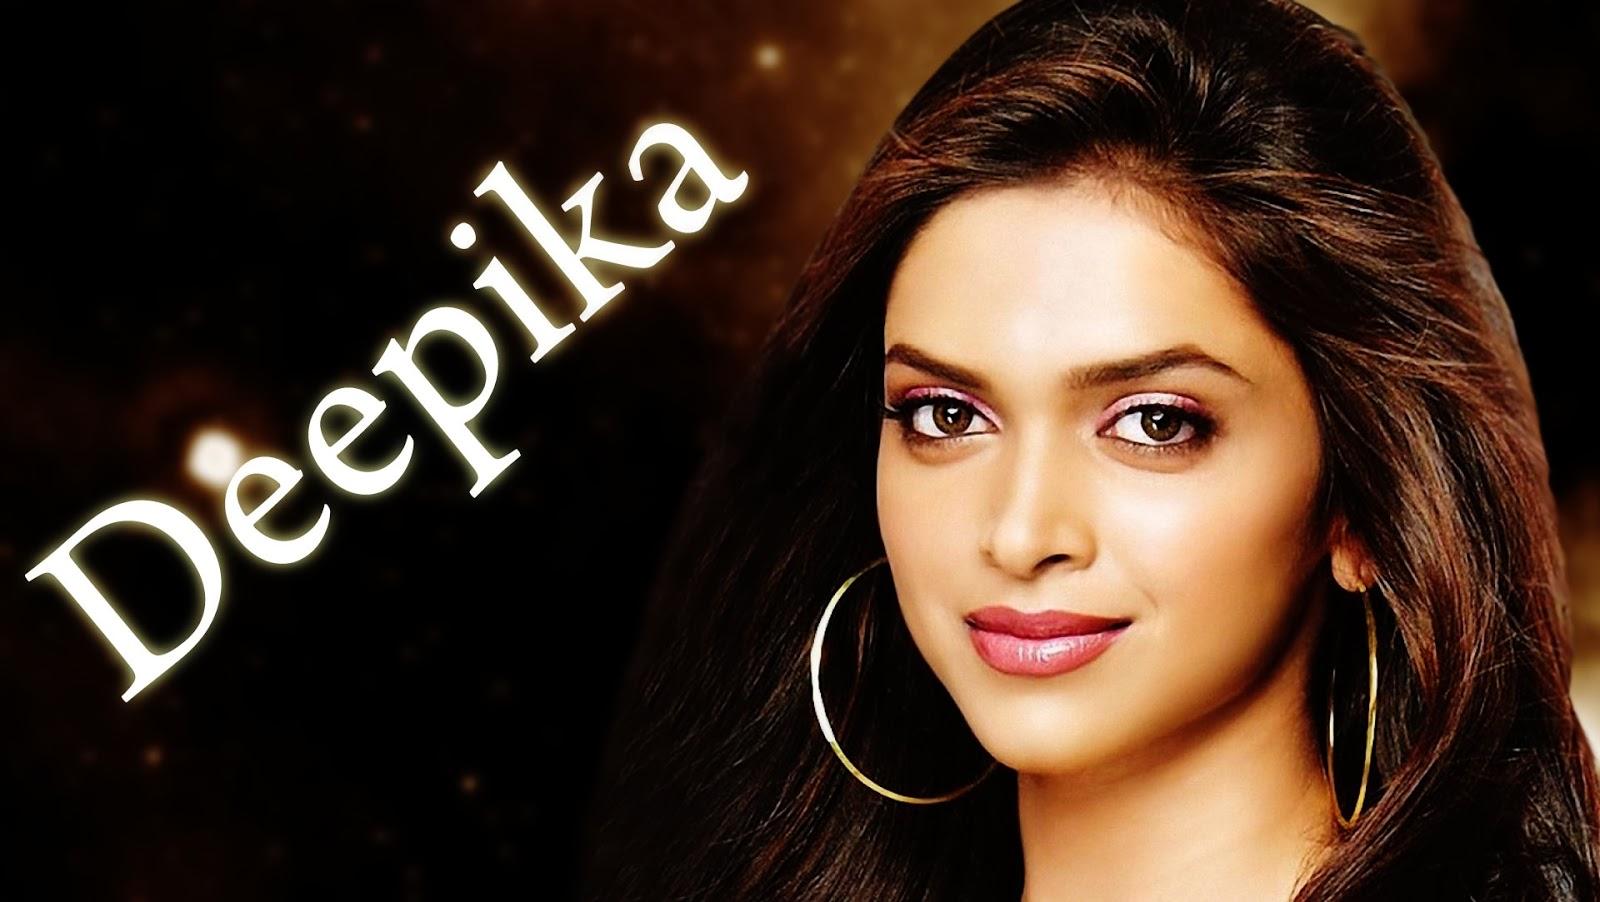 Free Stars Wallpaper: Deepika Padukone Free Stars Wallpaper